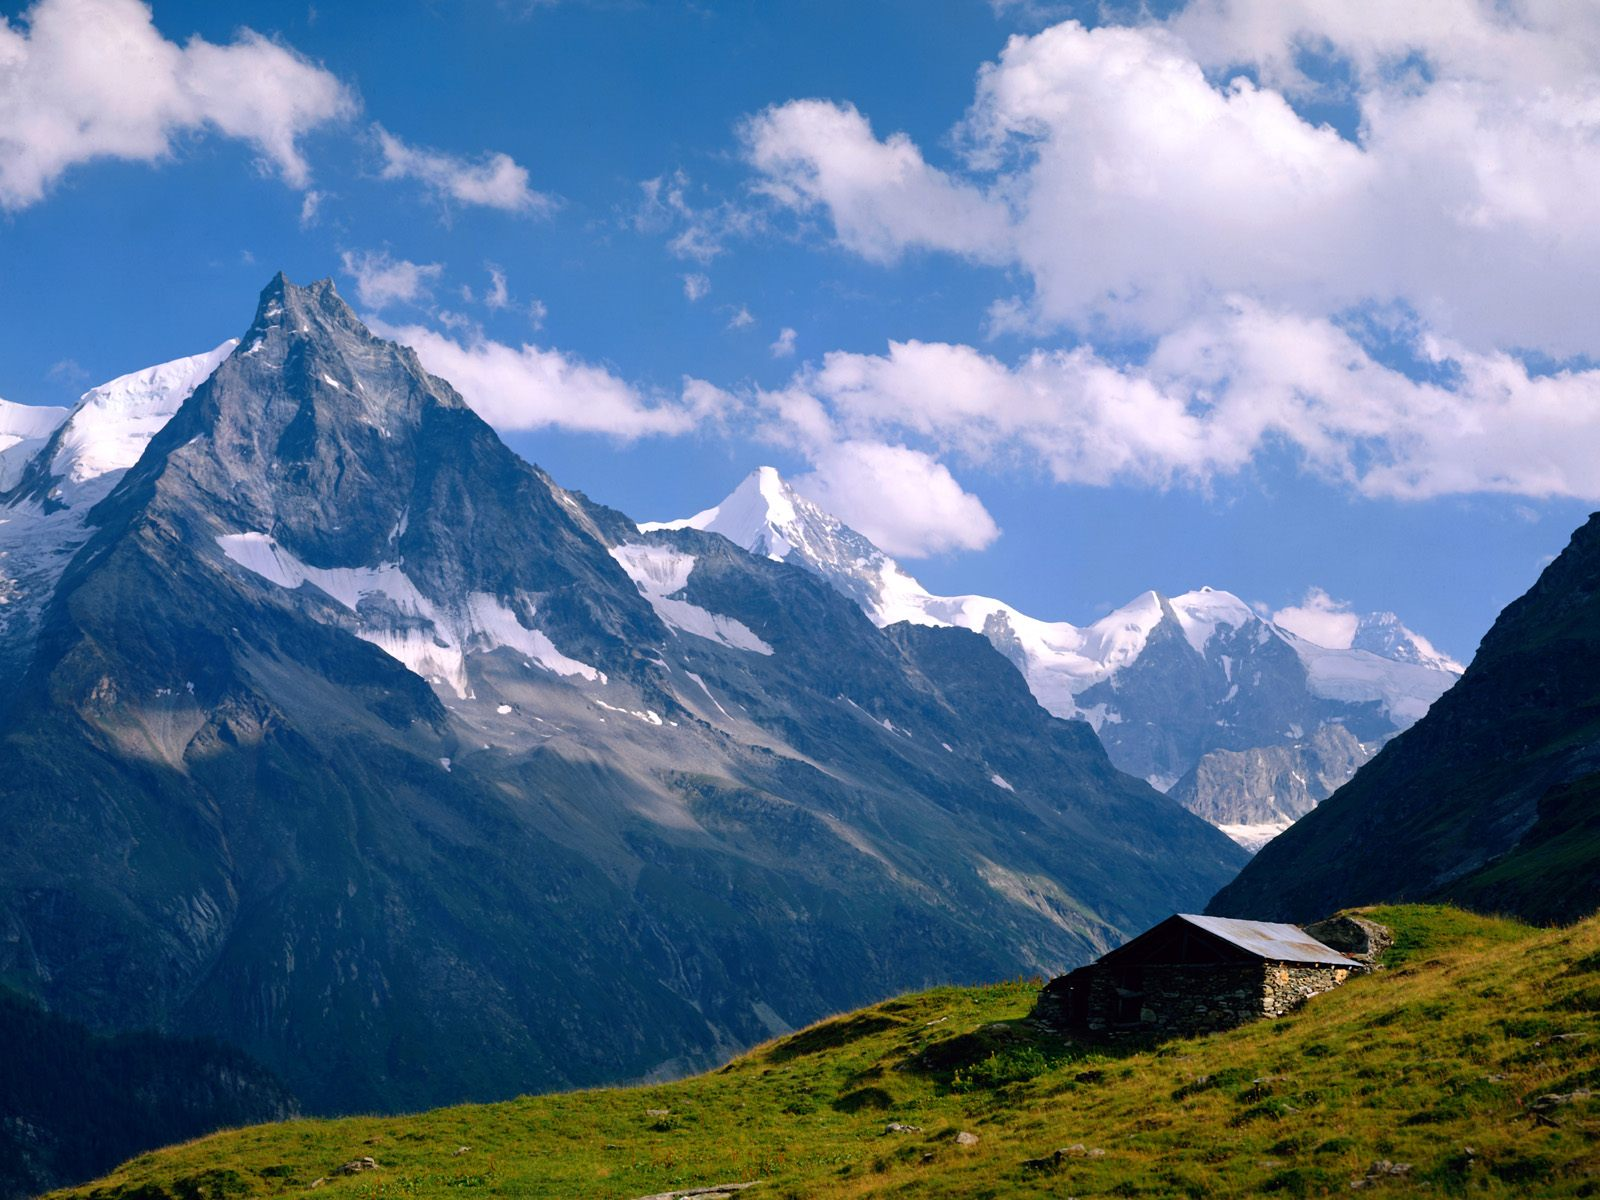 картинка пейзажа гор